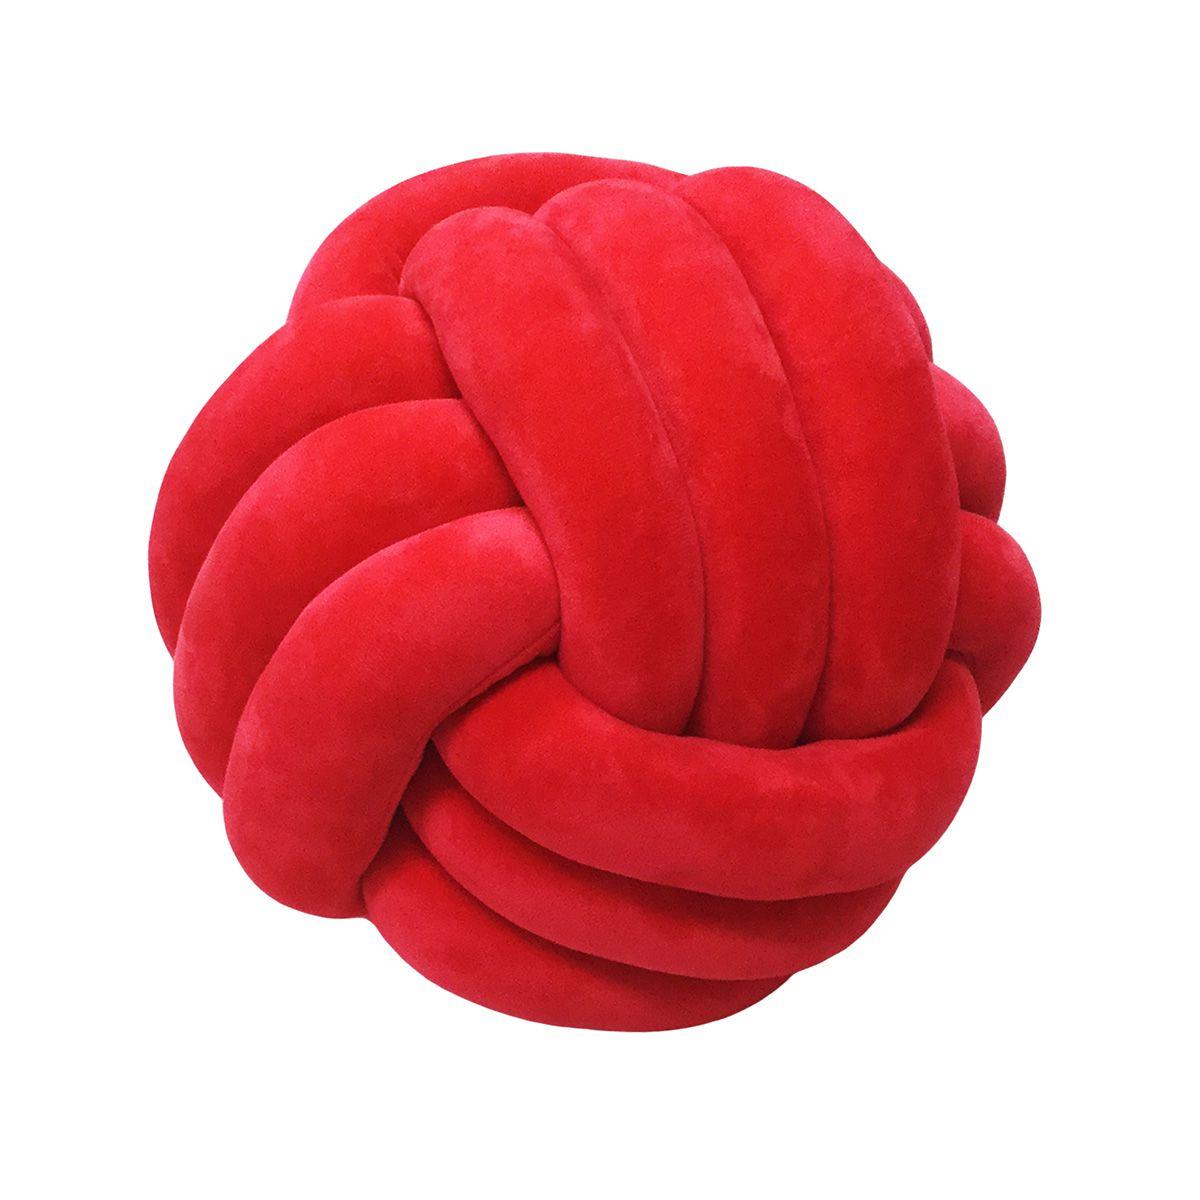 Almofada Nó - Vermelho - 27cm - Niazitex